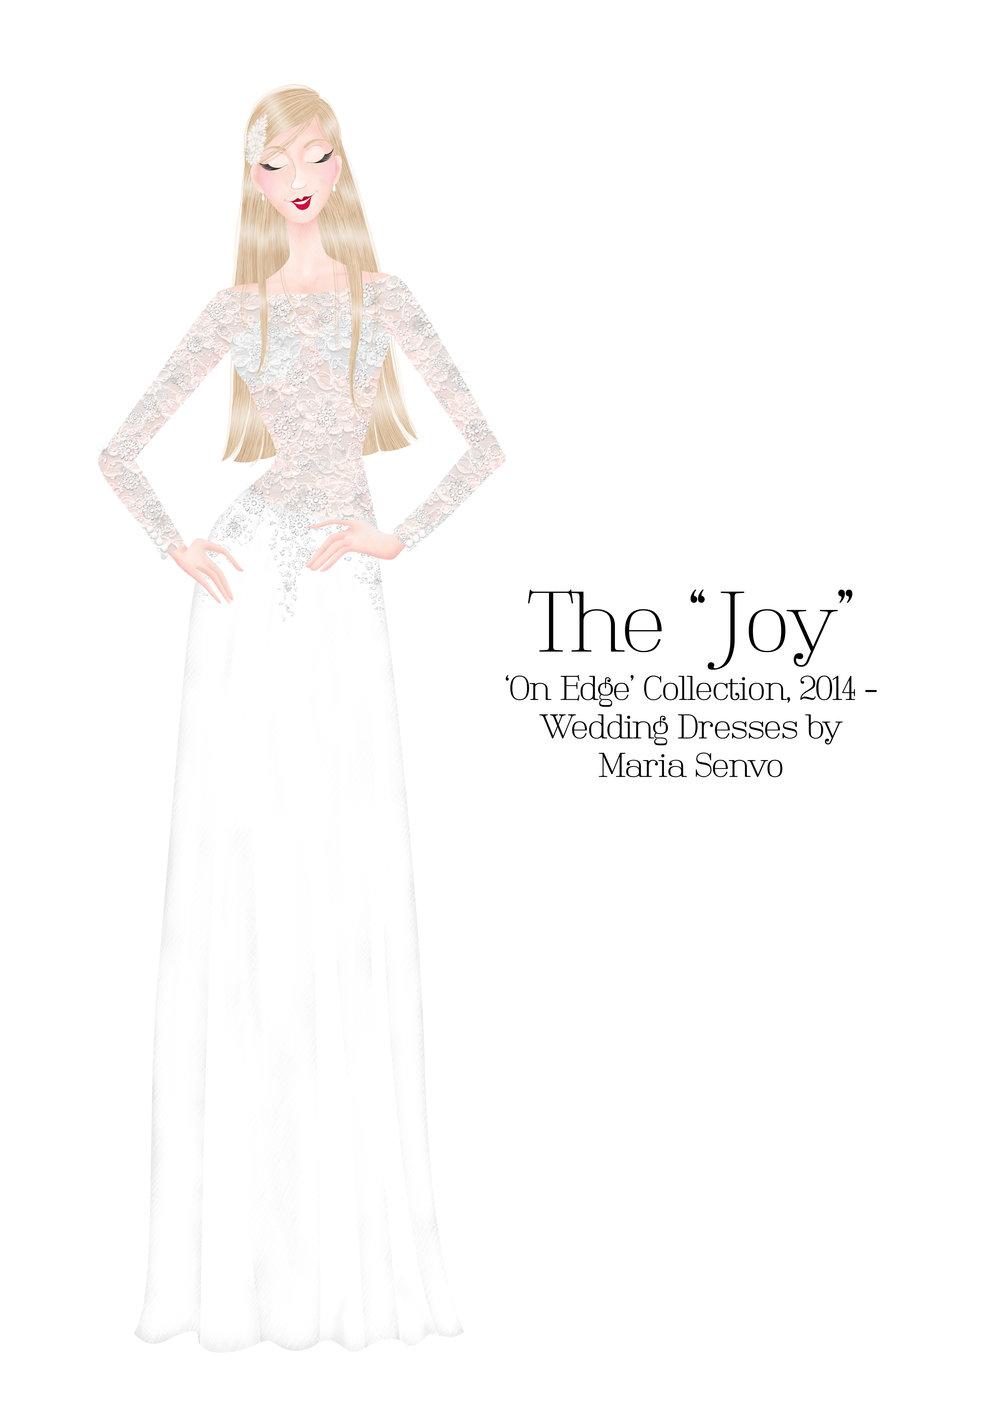 Hannah-Weeks-Illustration-The-Joy.jpg